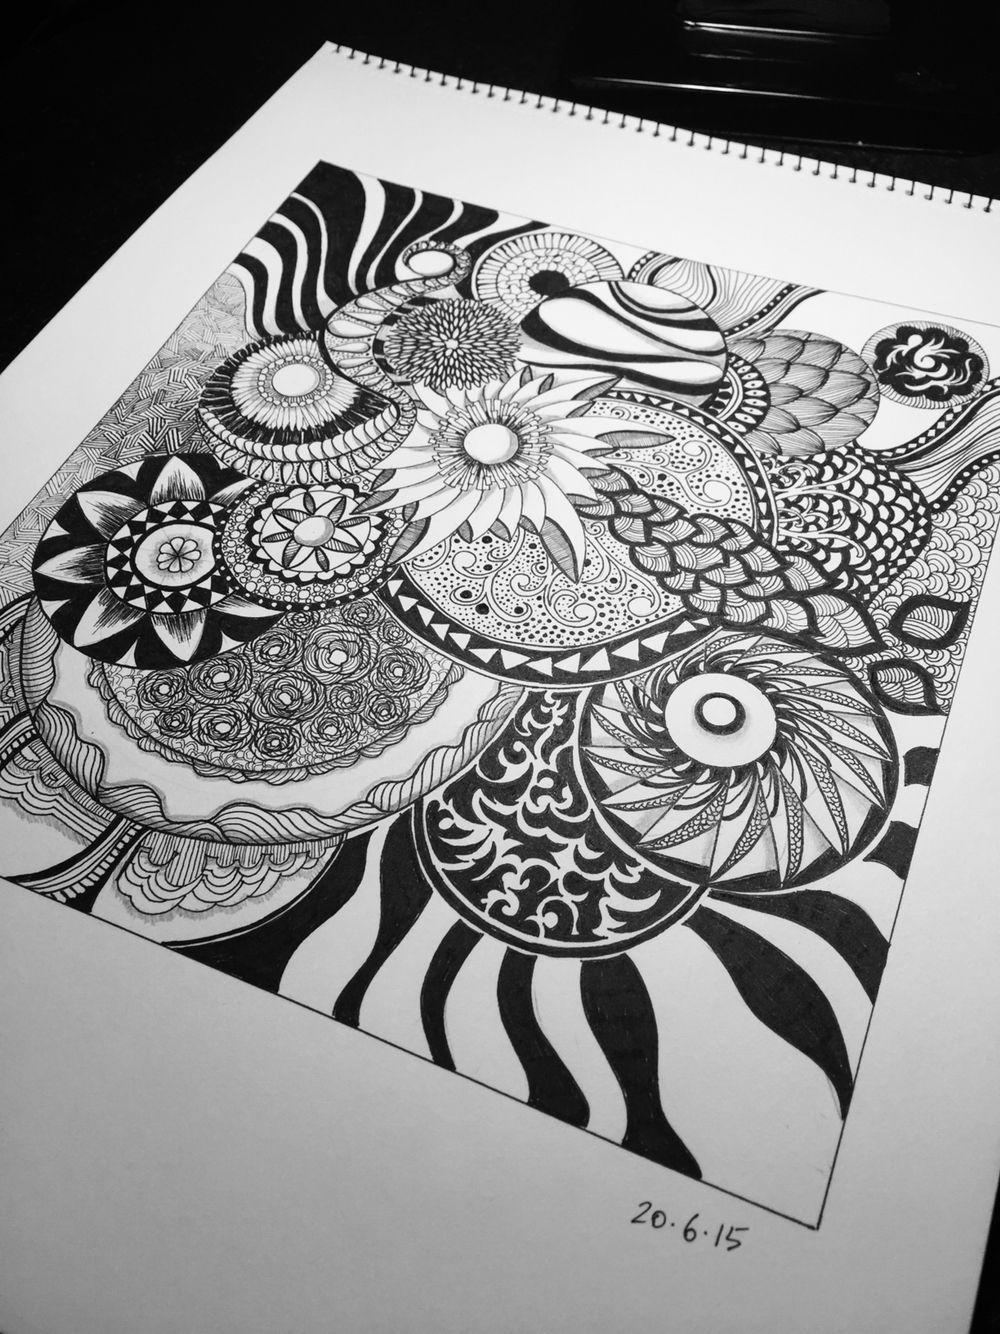 Circle spinning #zentangle #art #design #creative #drawing #illustration